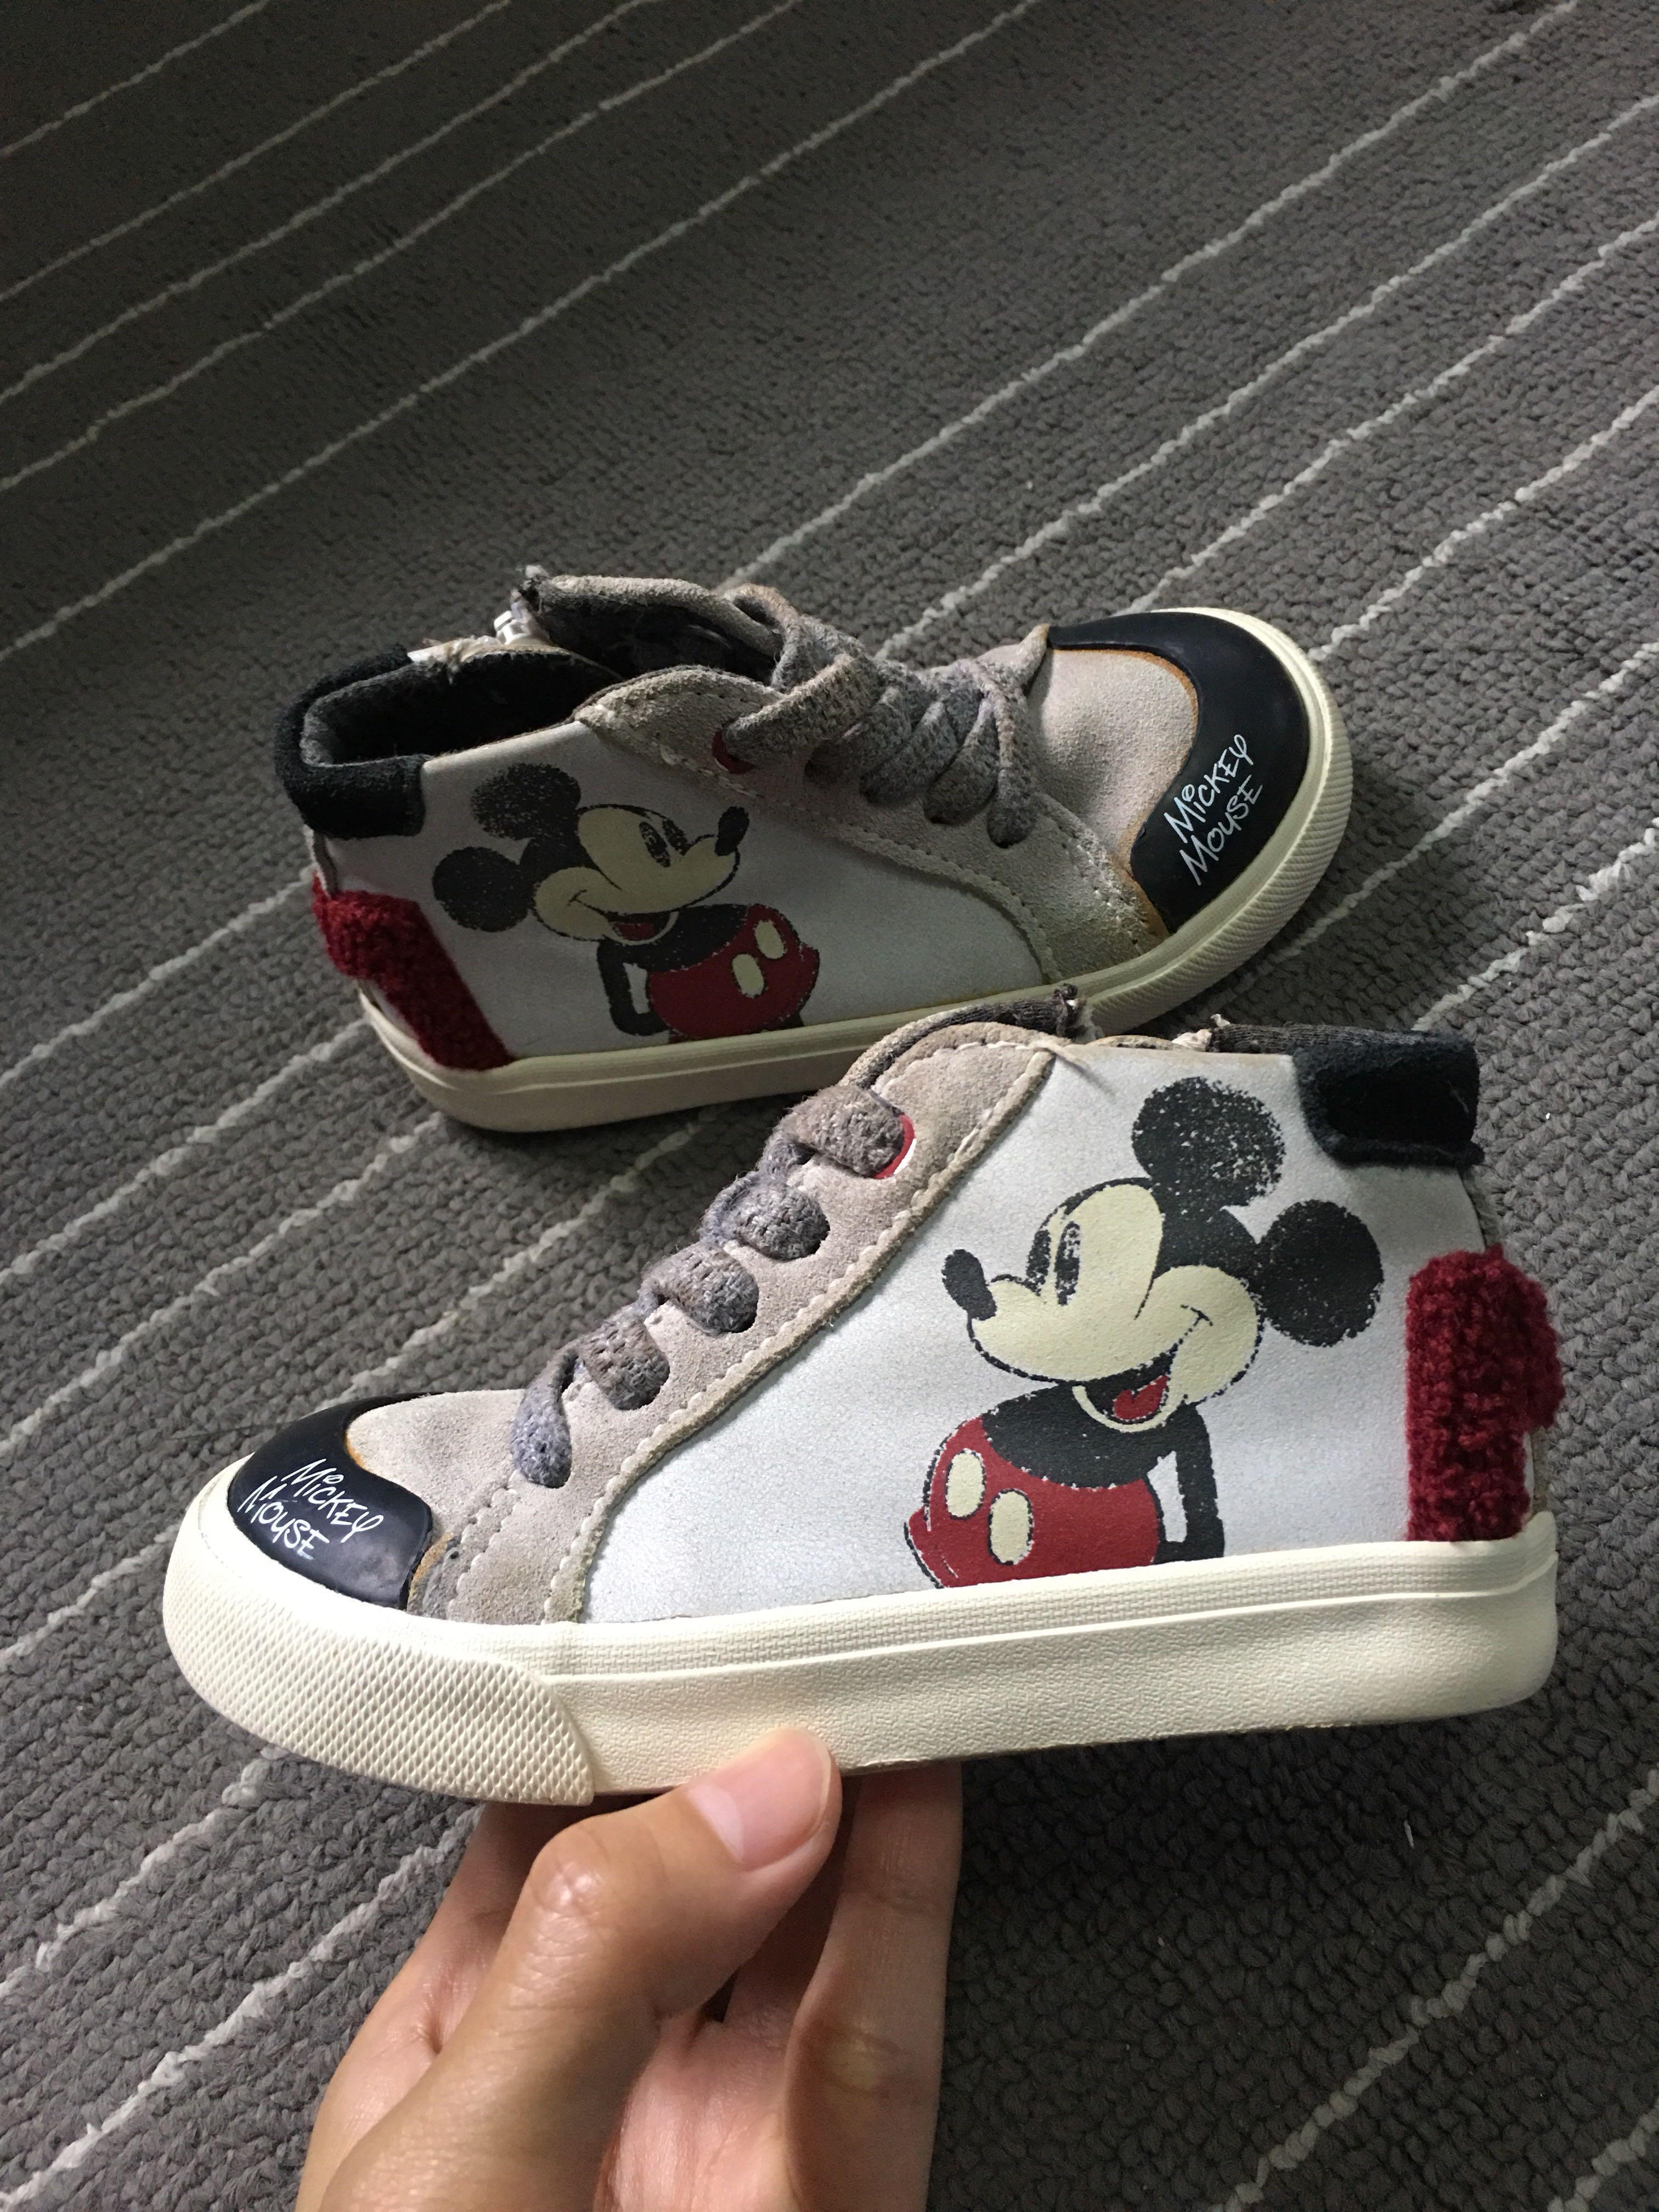 Sepatu Mickey Mouse Zara Original Size 23 Babies Kids Others